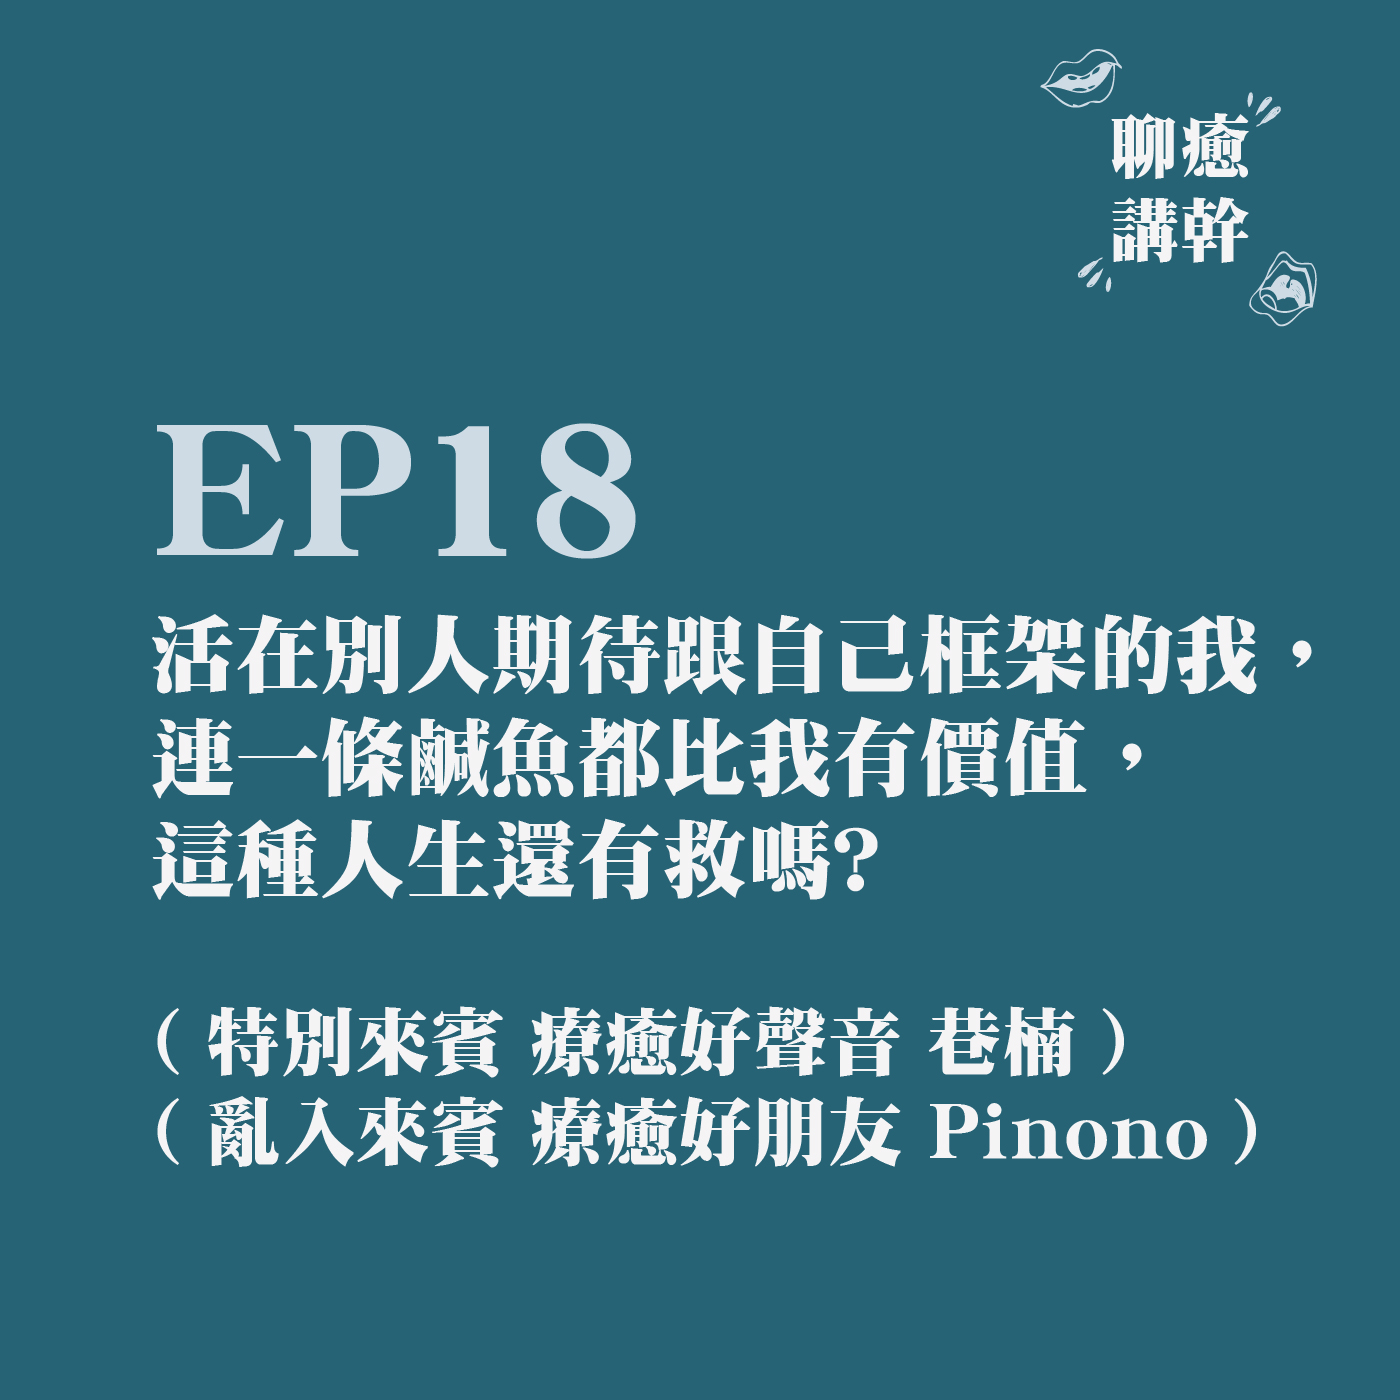 EP18 - 活在別人期待跟自己框架的我,連一條鹹魚都比我有價值,這種人生還有救嗎? Feat. 巷楠 & Pinono 半路亂入